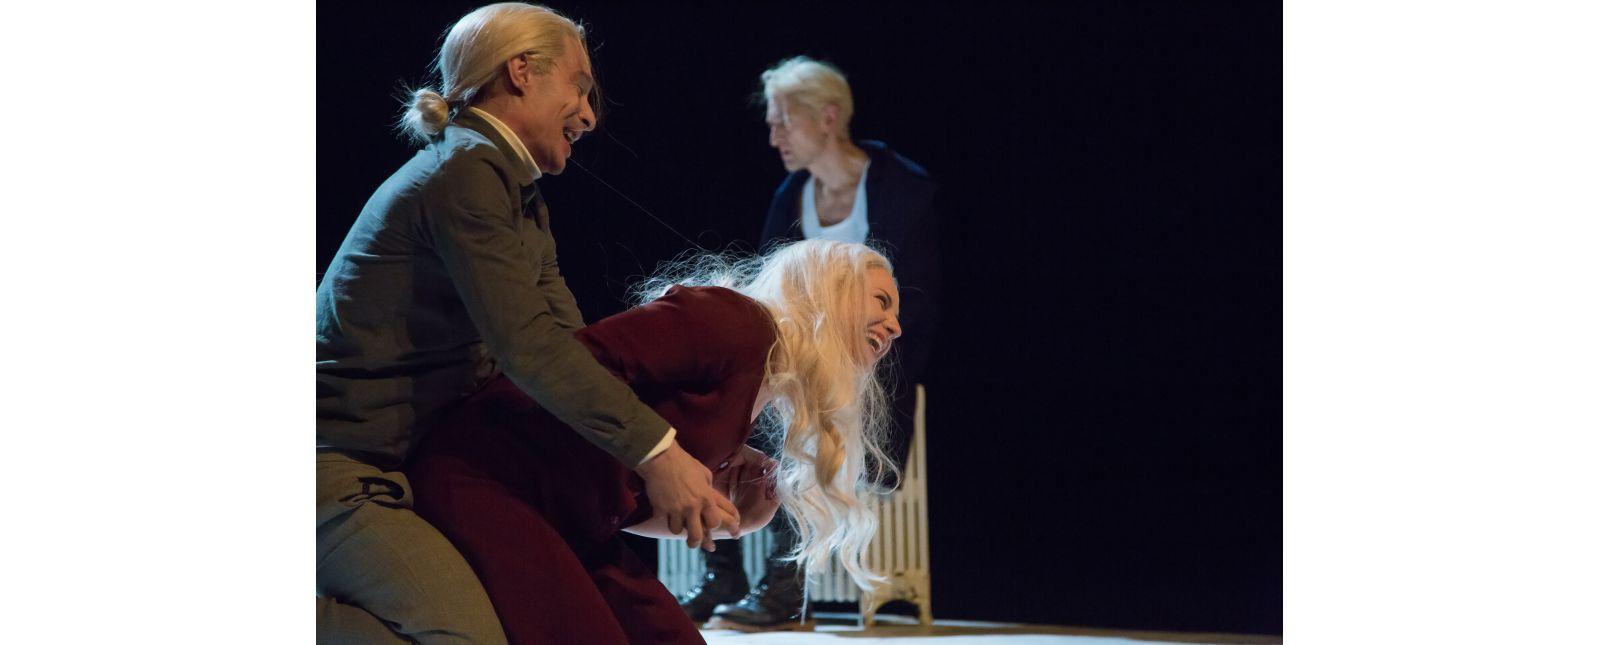 Totentanz // Martin Hohner, Marieke Kregel, Victor Calero // 2017 // Laura Nickel